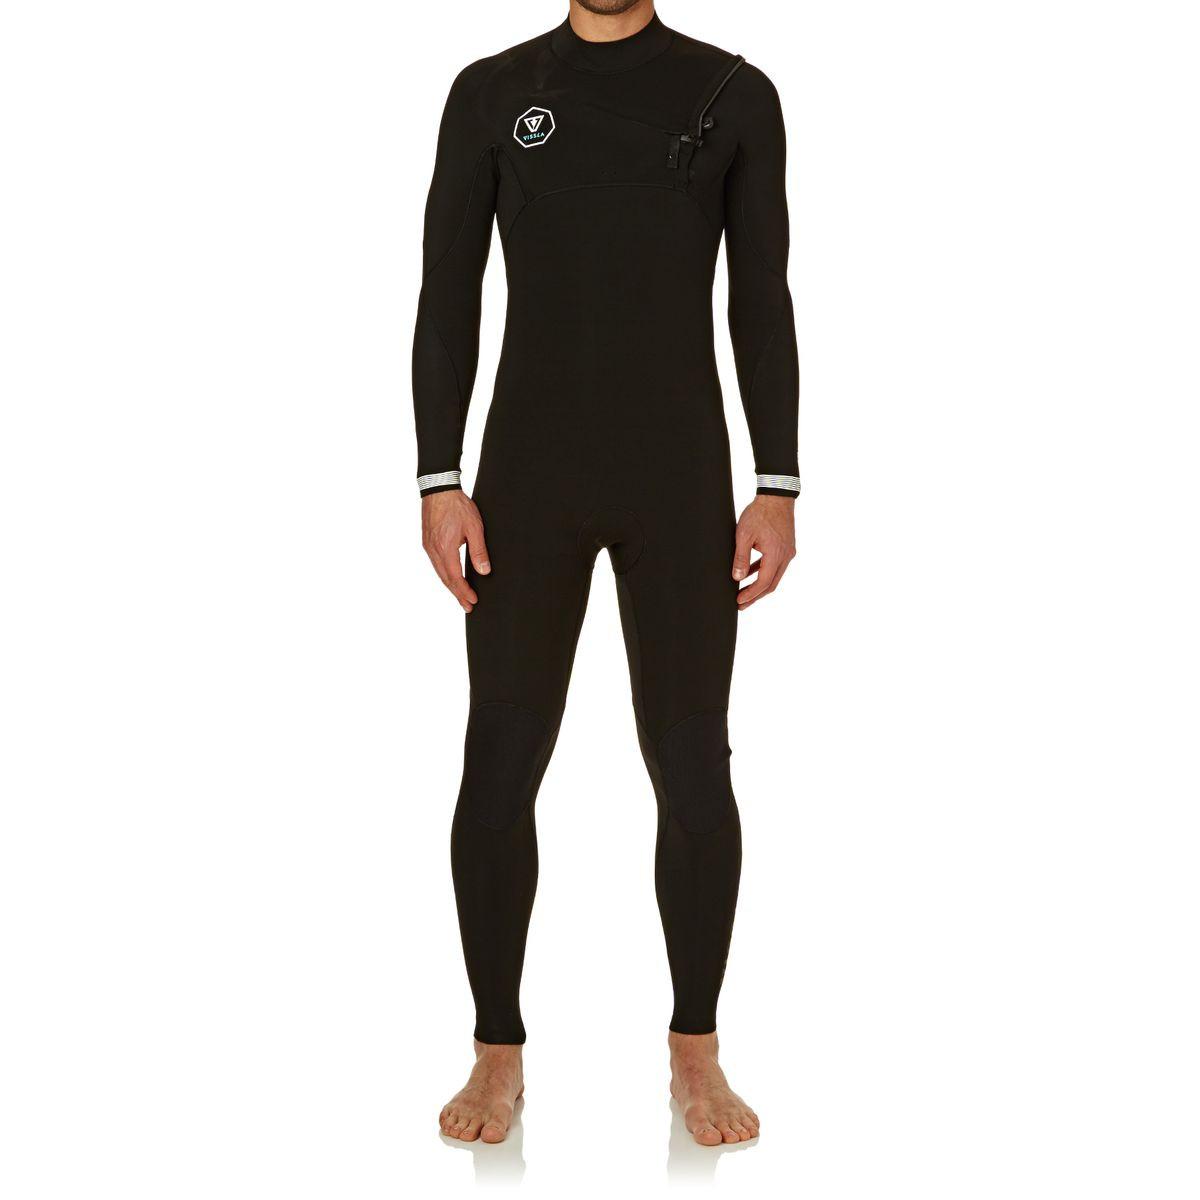 Vissla Seven Seas 2mm 2017 Chest Zip Wetsuit - Black With White